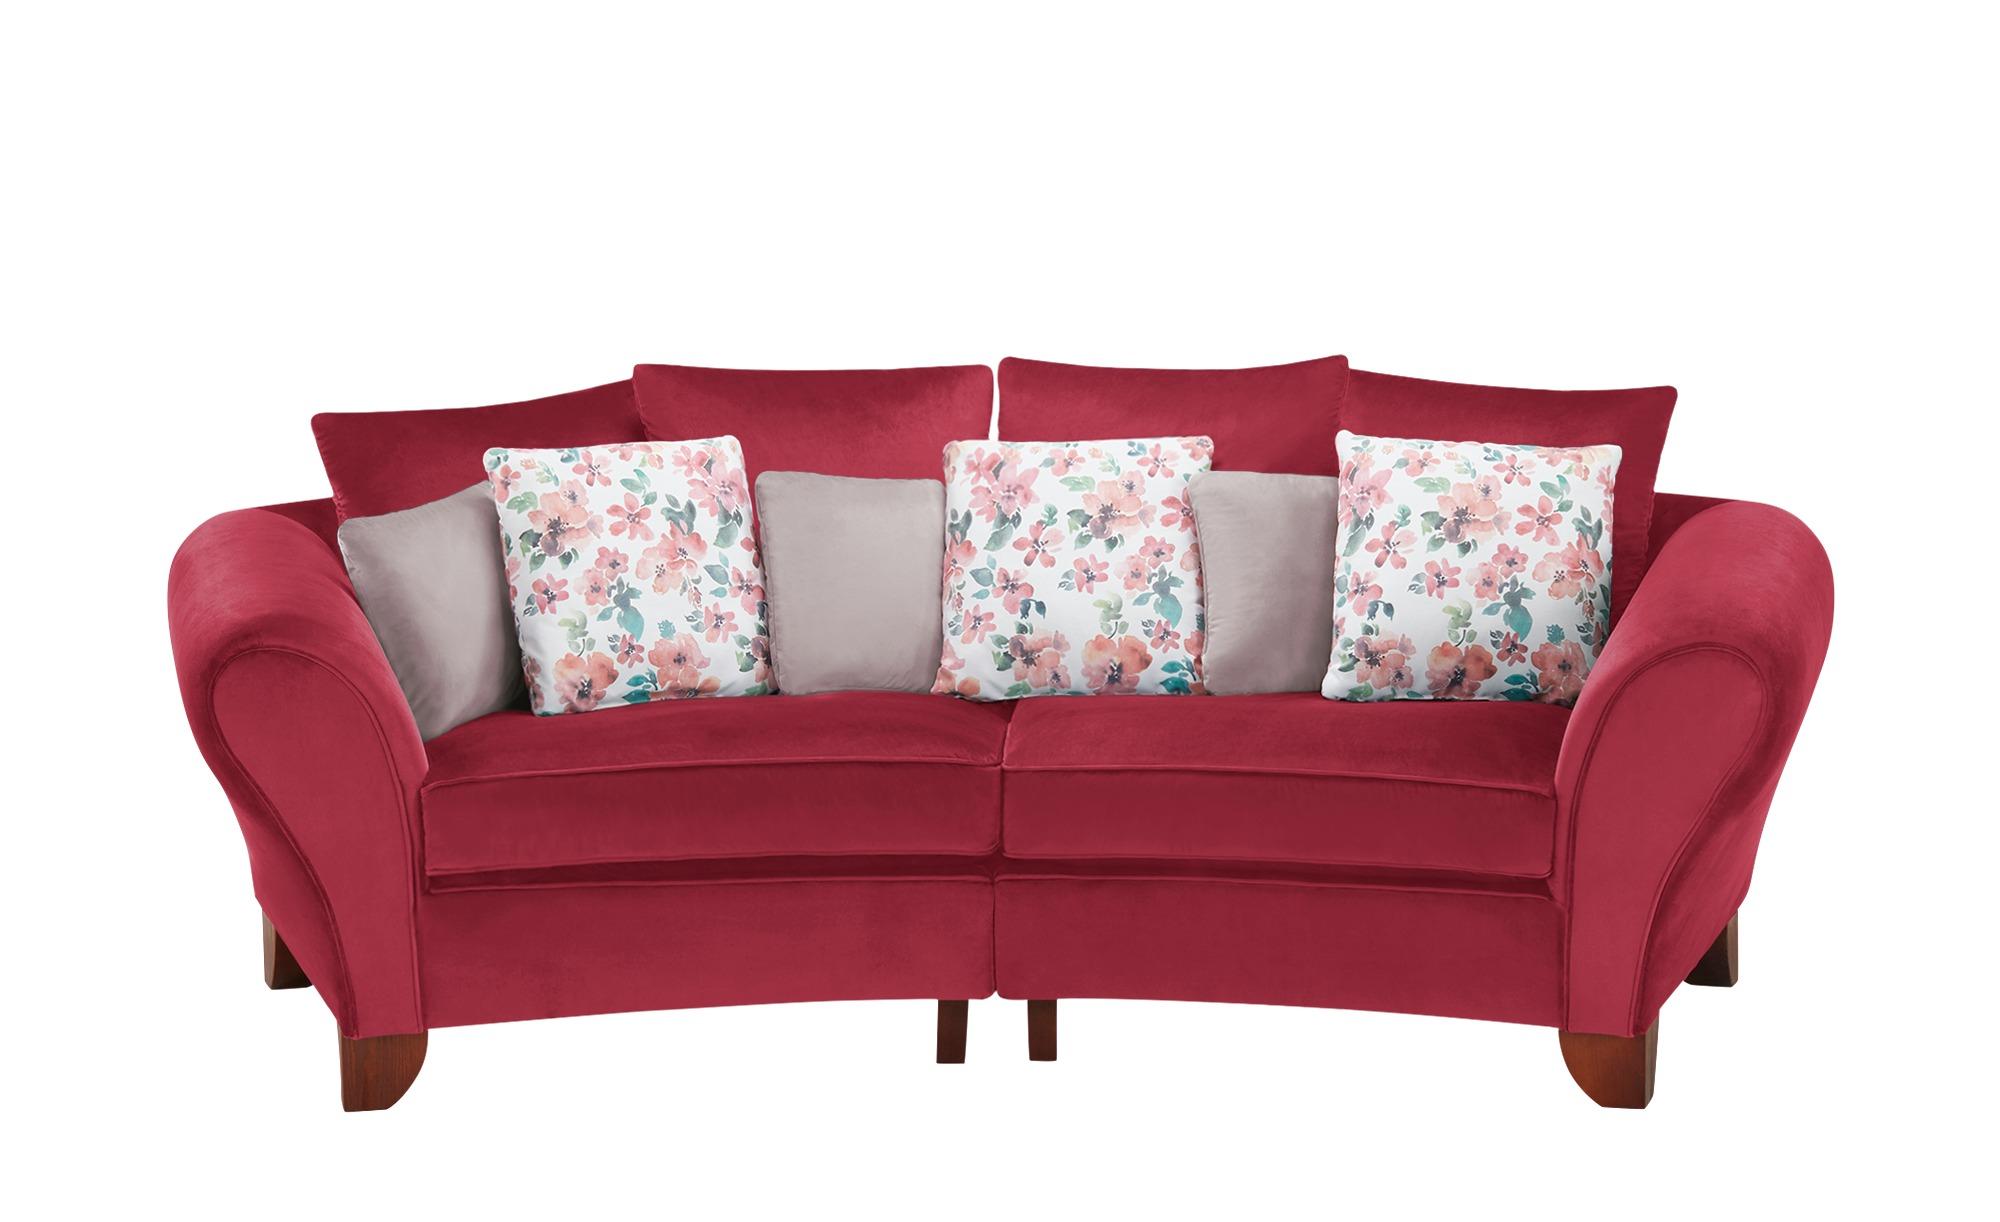 smart Big Sofa  Nadja ¦ rot ¦ Maße (cm): B: 277 H: 95 T: 108 Polstermöbel > Sofas > 3-Sitzer - Höffner